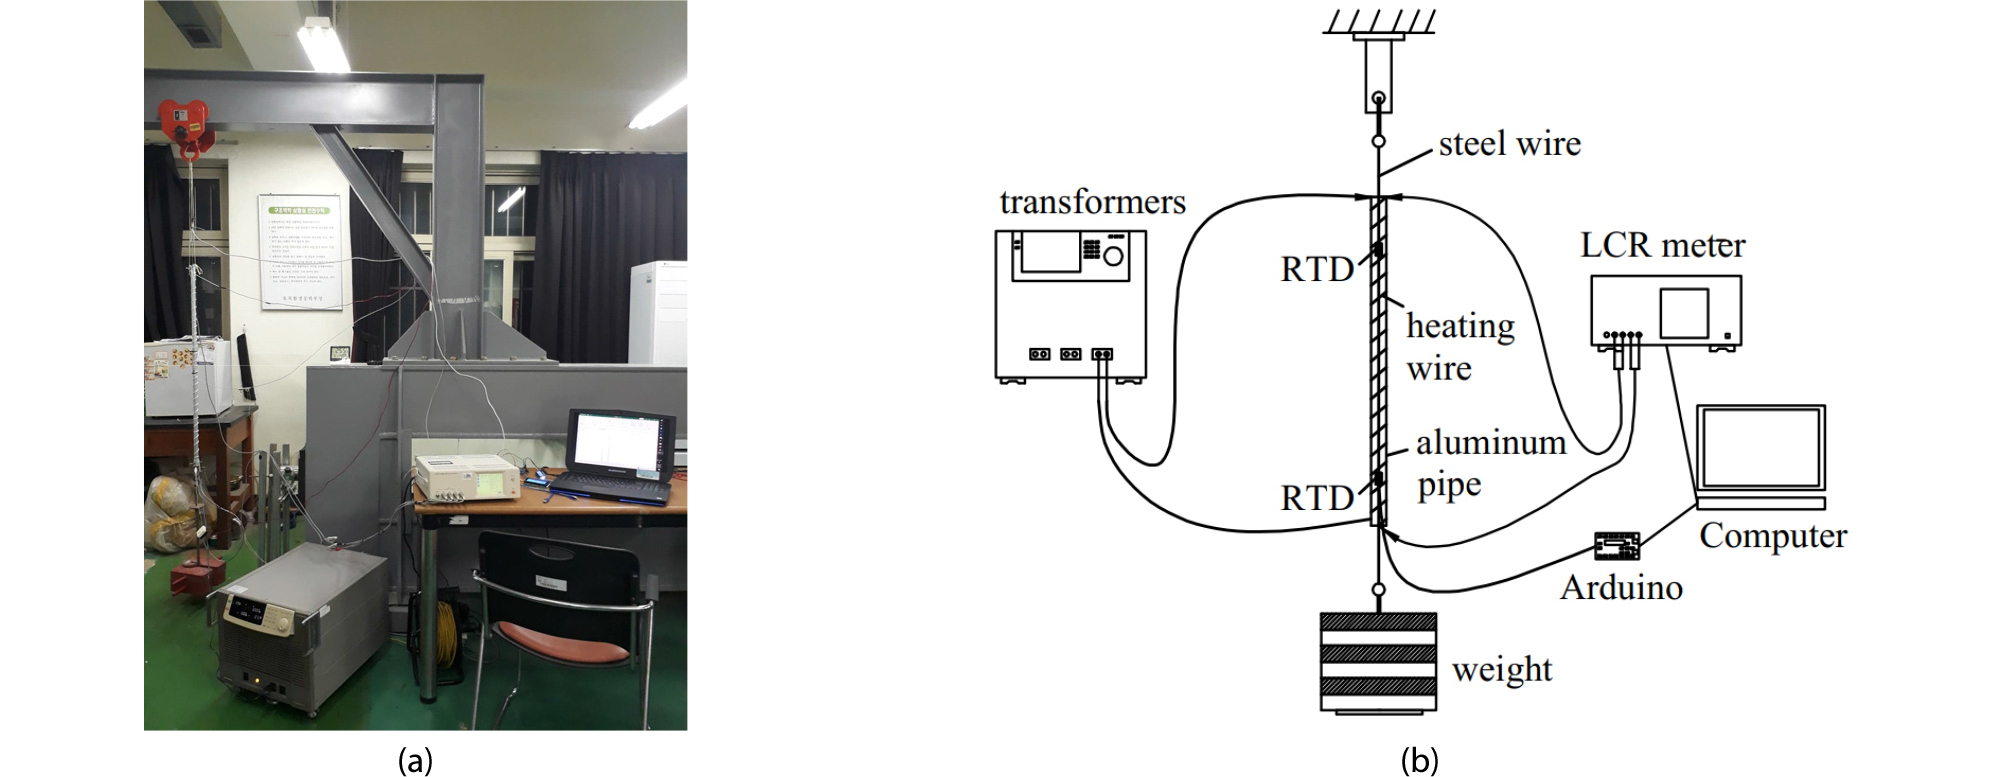 http://static.apub.kr/journalsite/sites/ksce/2020-040-02/N0110400206/images/Figure_KSCE_40_02_06_F1.jpg